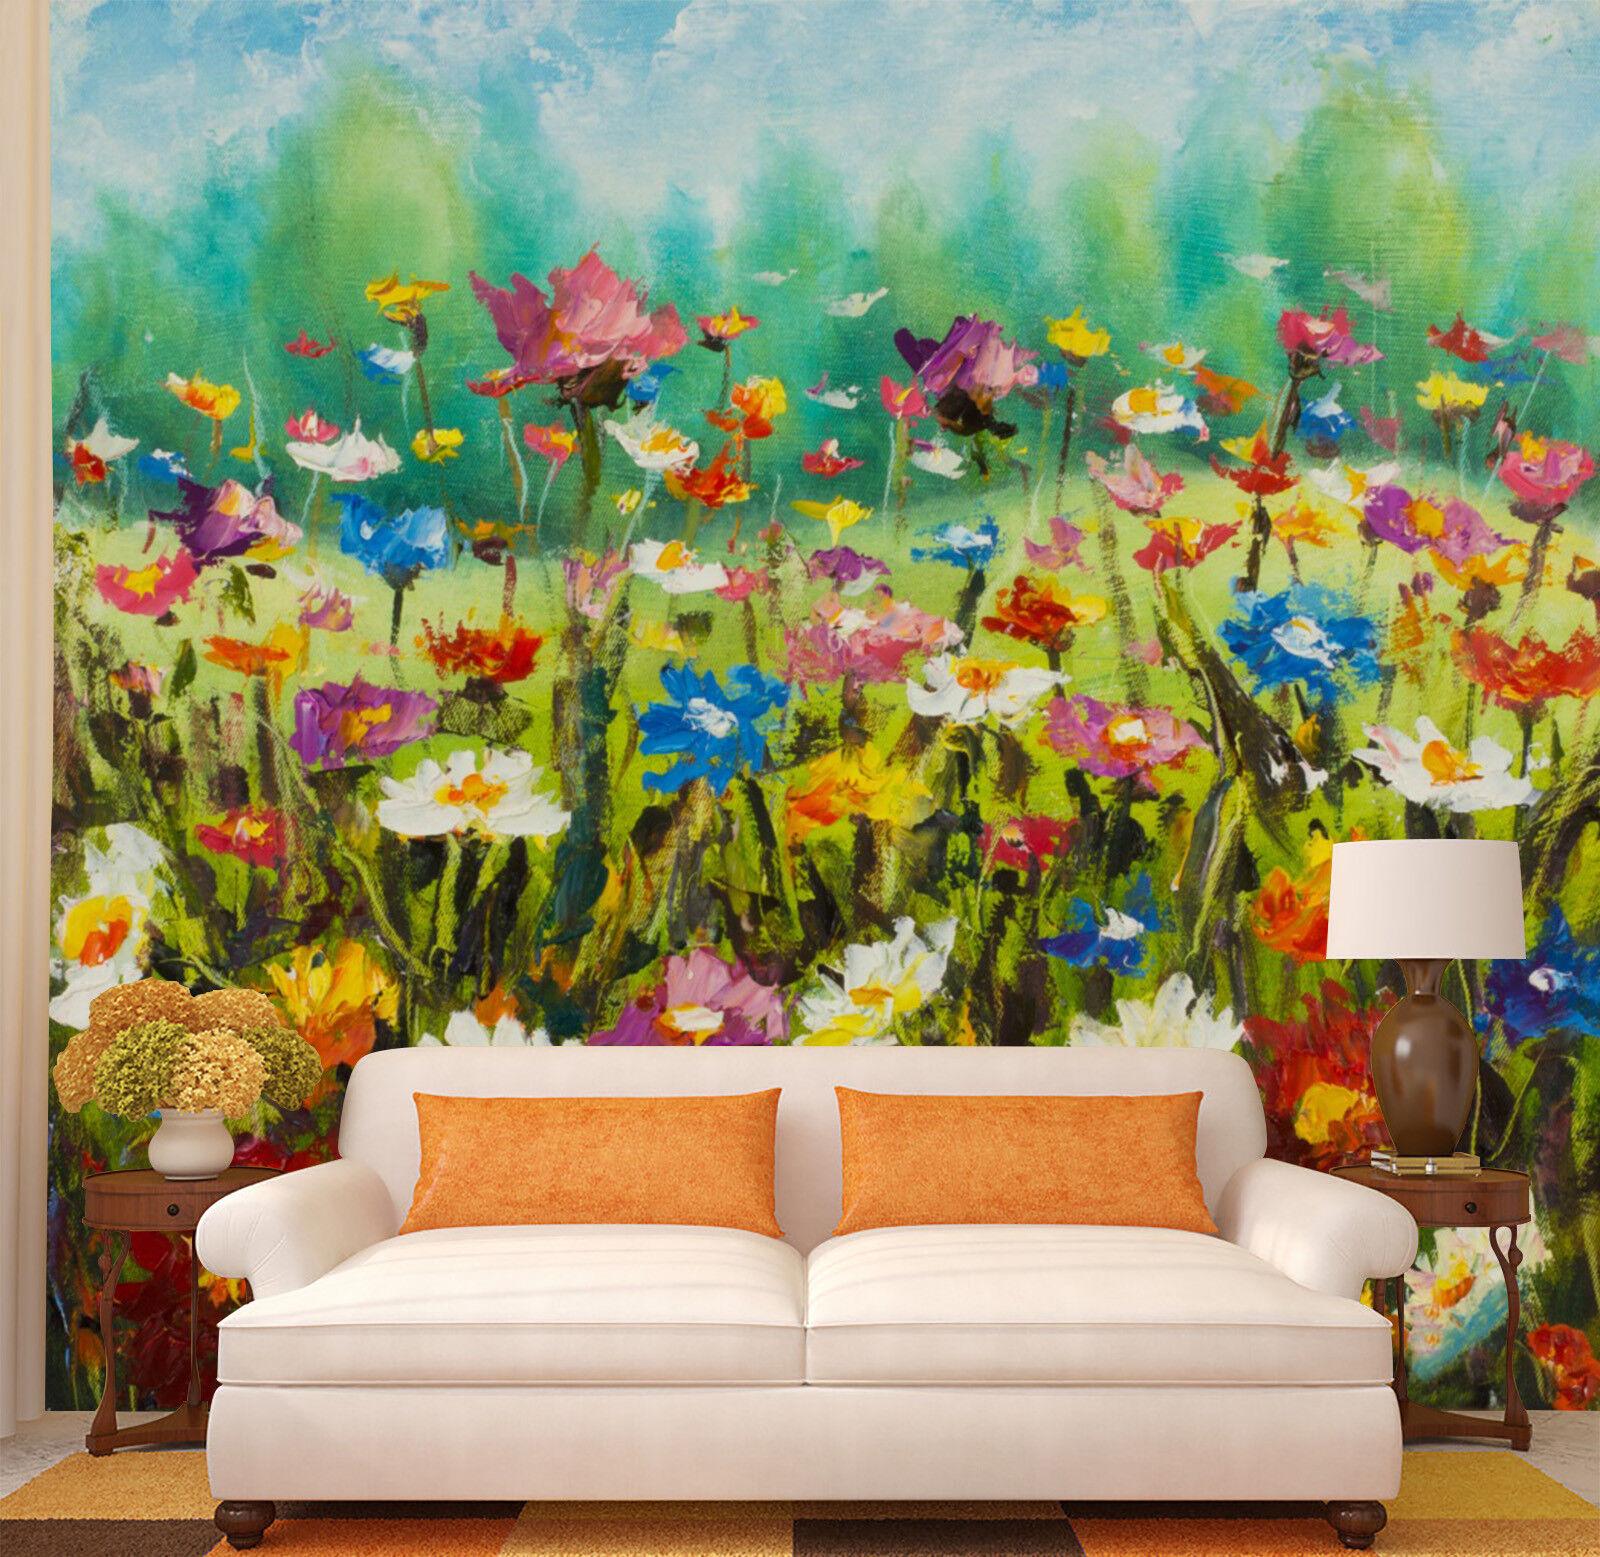 3D Flowers Paint 69 Wallpaper Murals Wall Print Wallpaper Mural AJ WALL AU Lemon